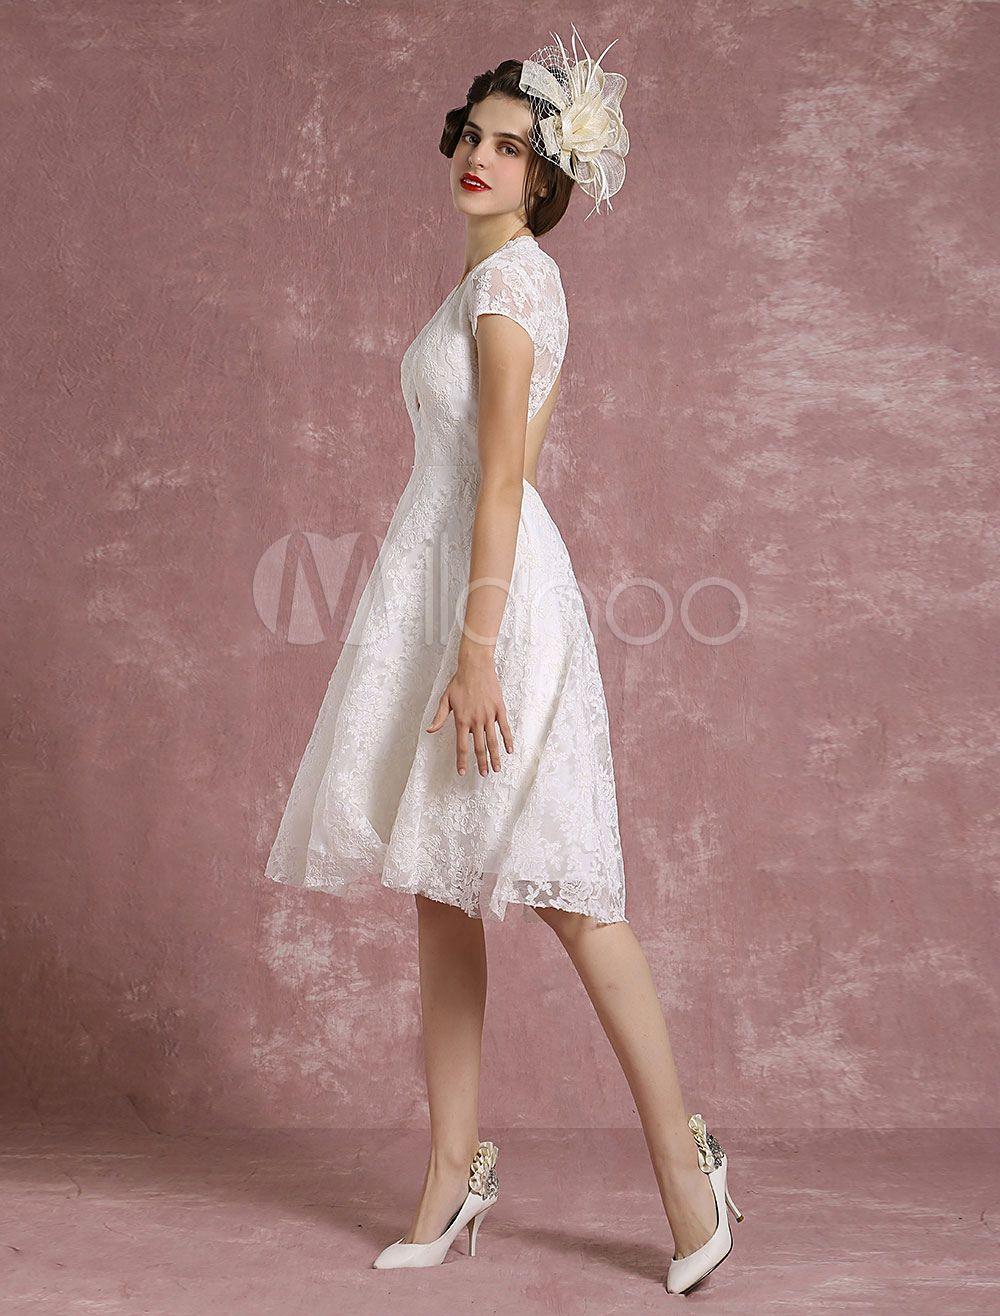 Kurzes Hochzeitskleid Spitze Elfenbein Brautkleid V Ansatz Backless ...